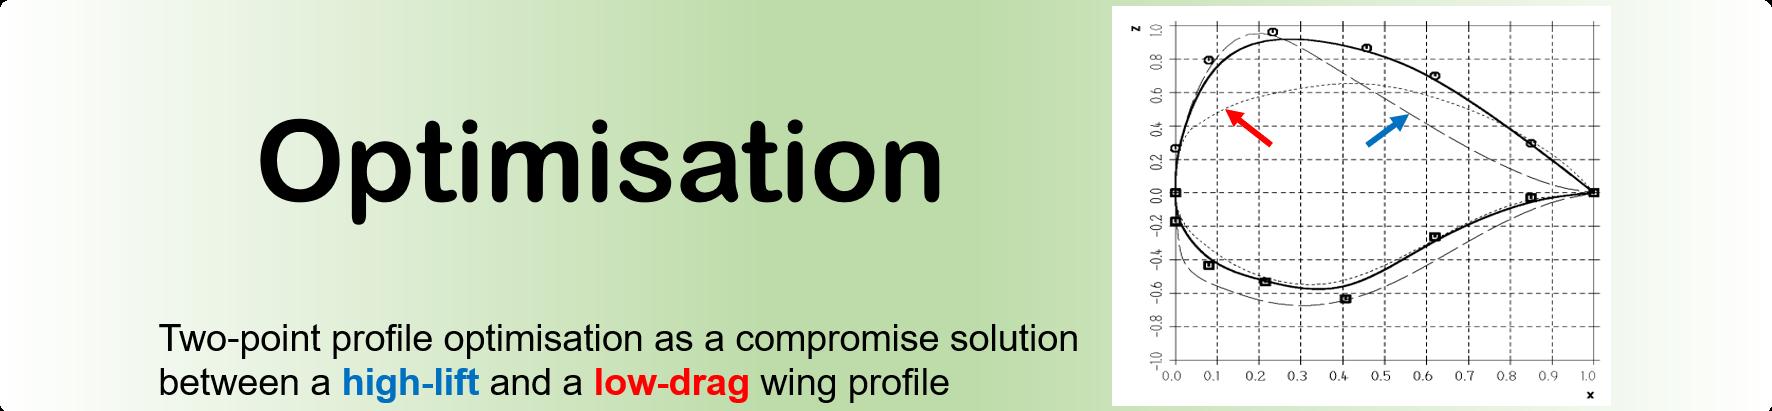 Slider_optimisation_19-12-10